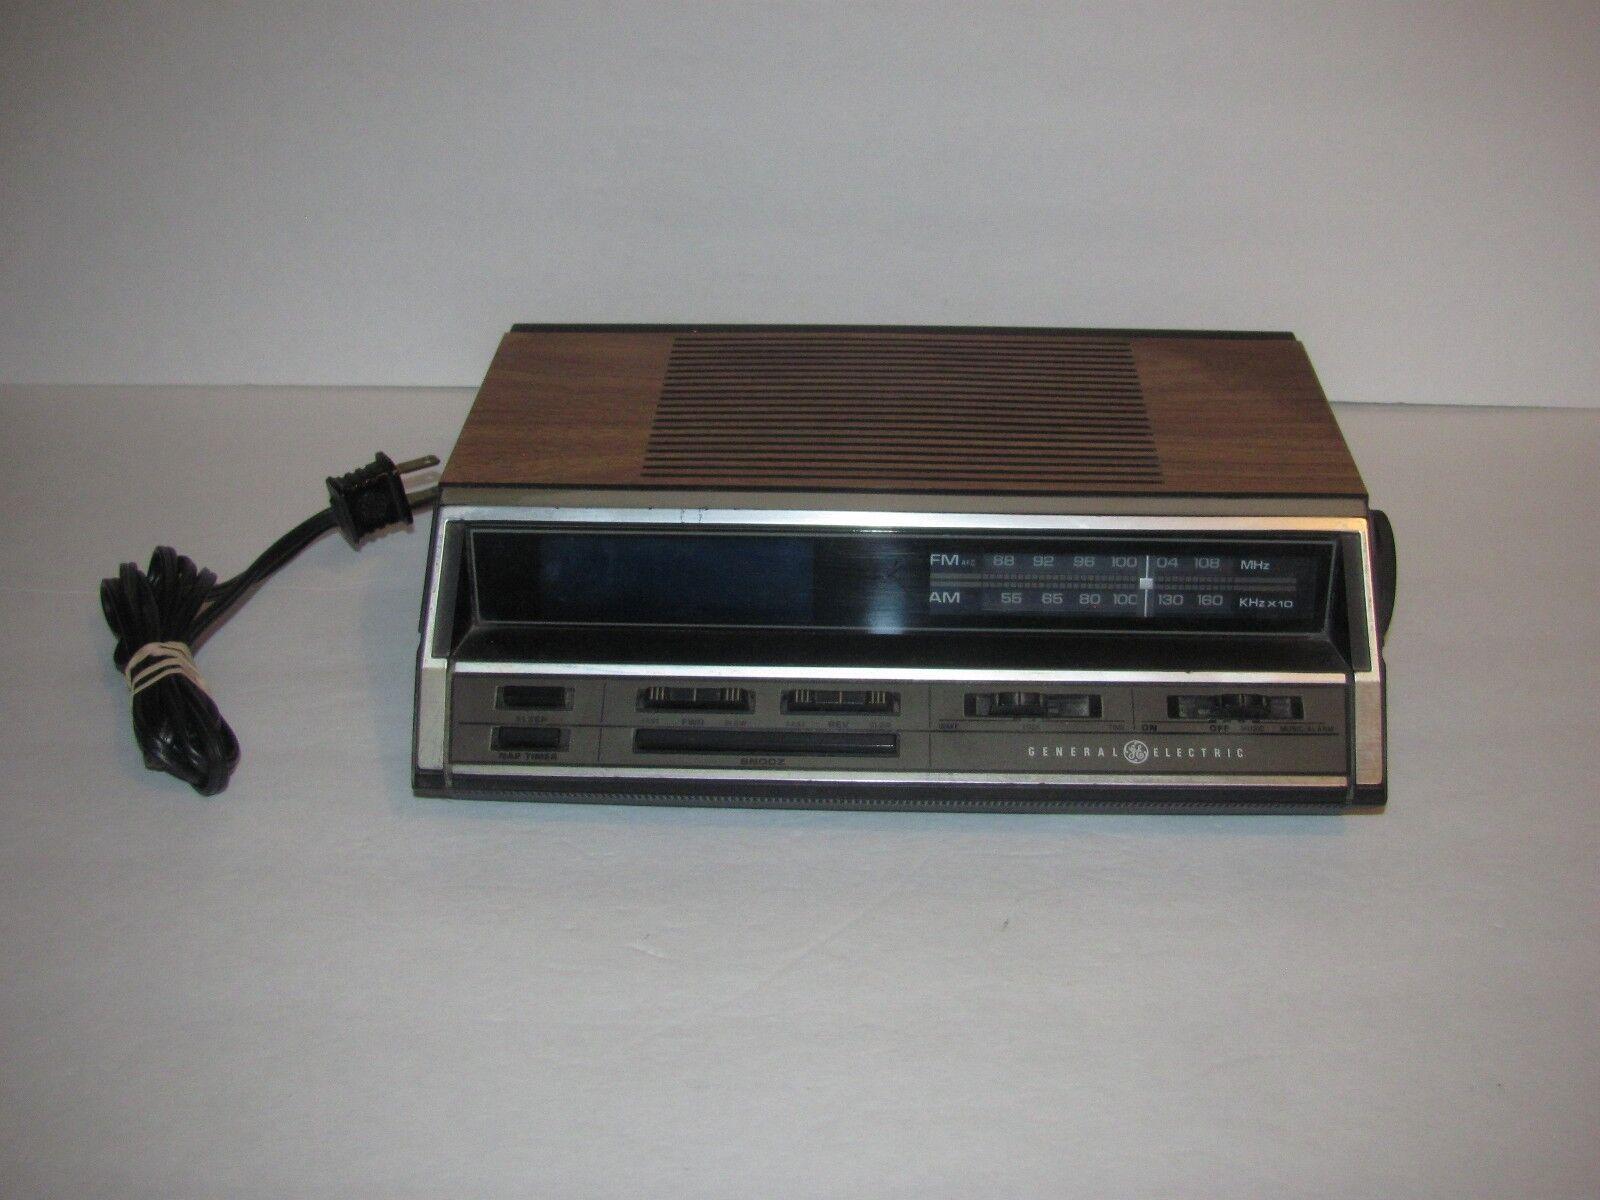 Vintage GE General Electric Digital Alarm Clock Radio #74666A Blue Display Retro